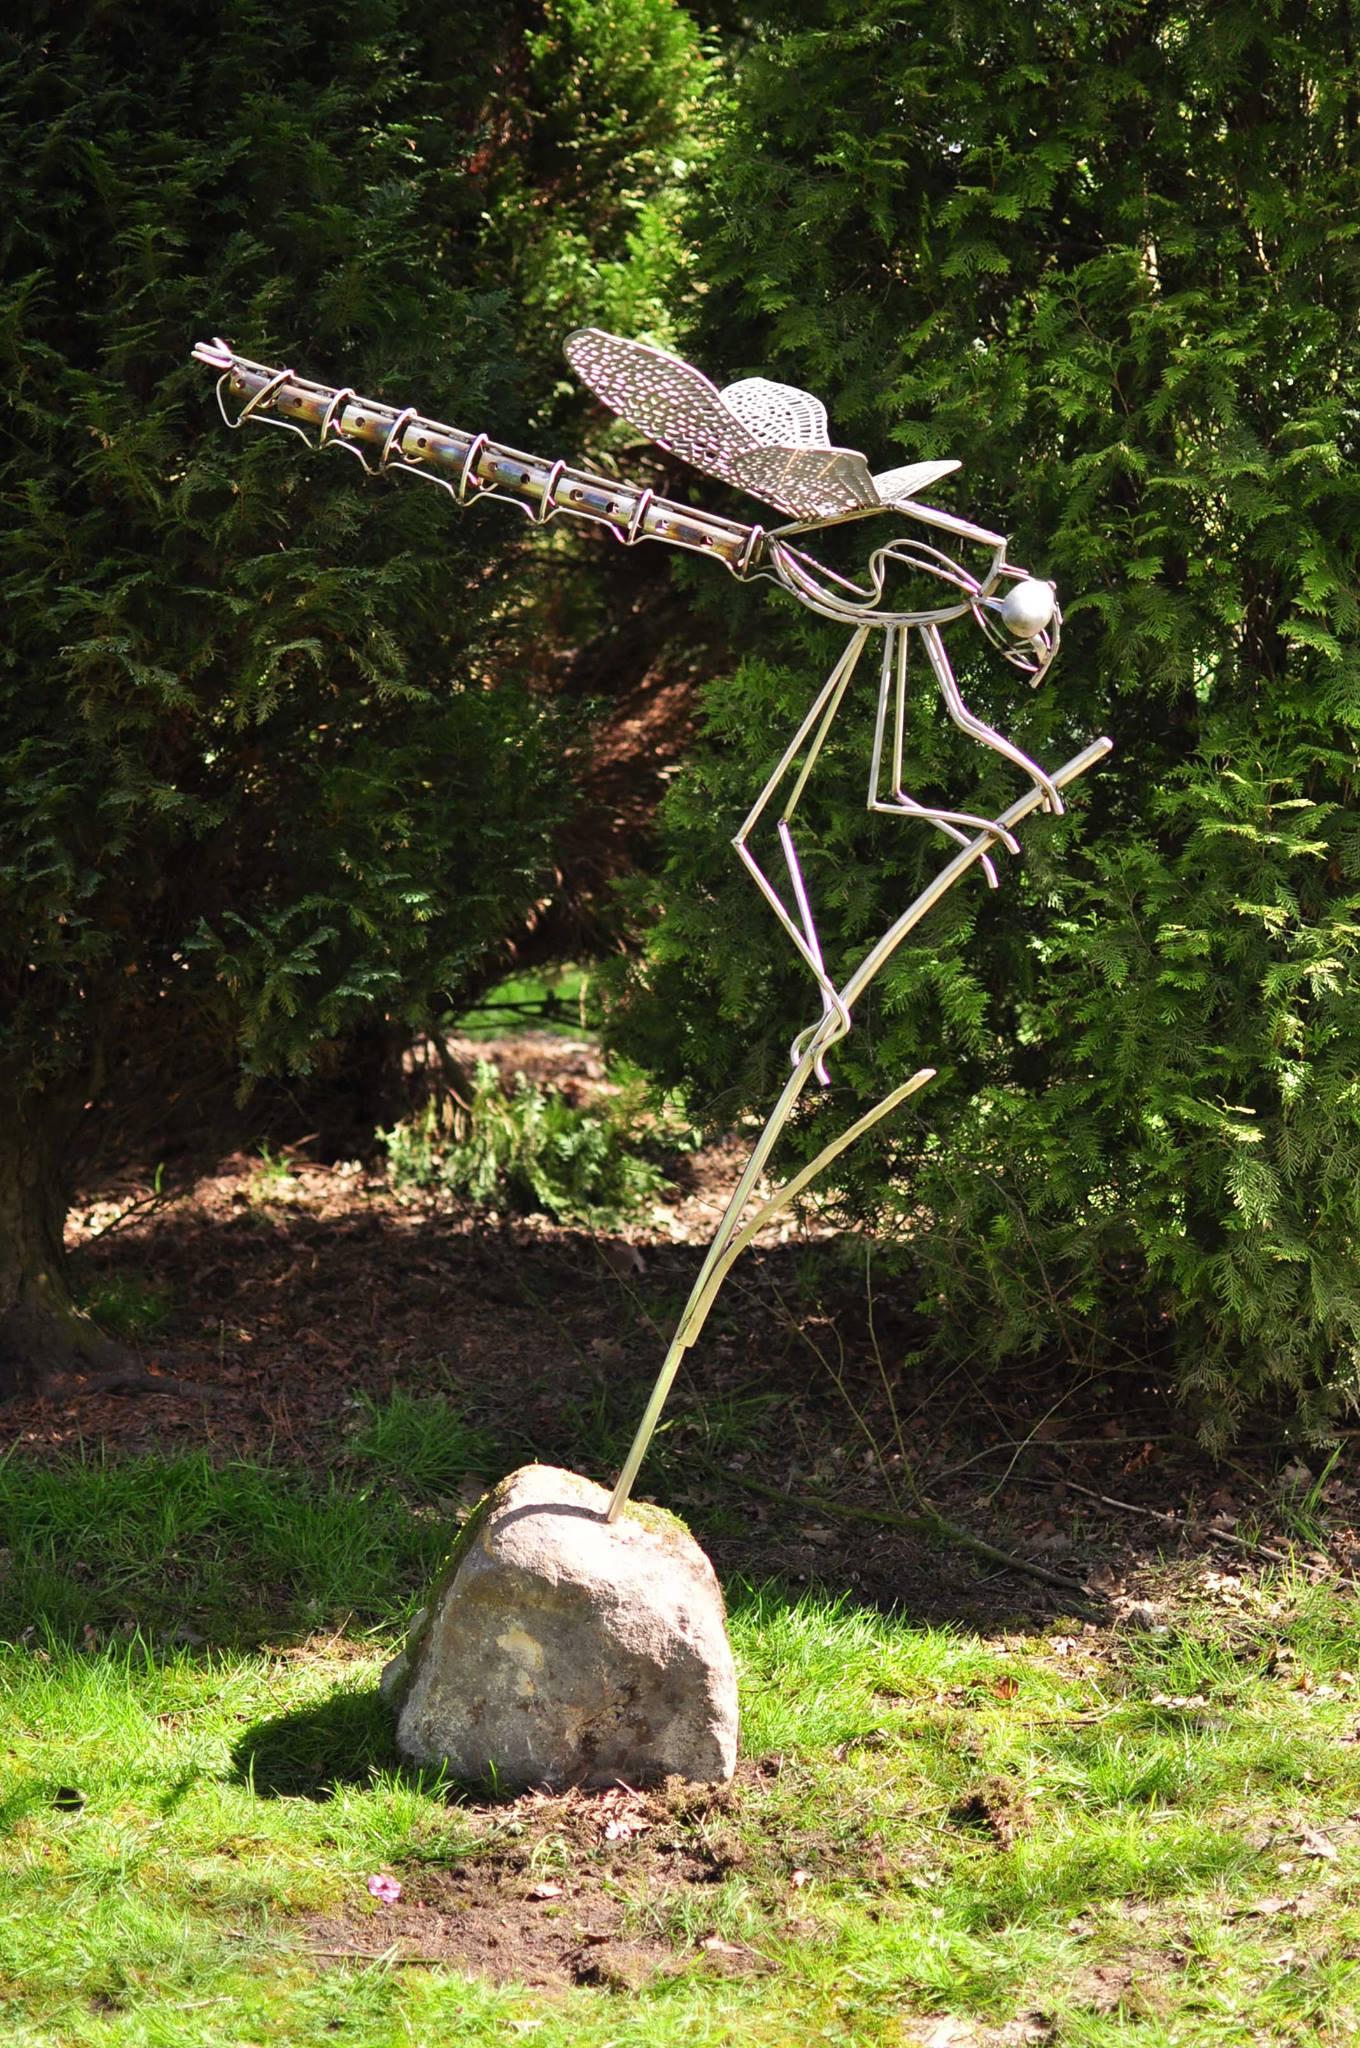 David Freedman – Stainless steel dragonfly sculpture